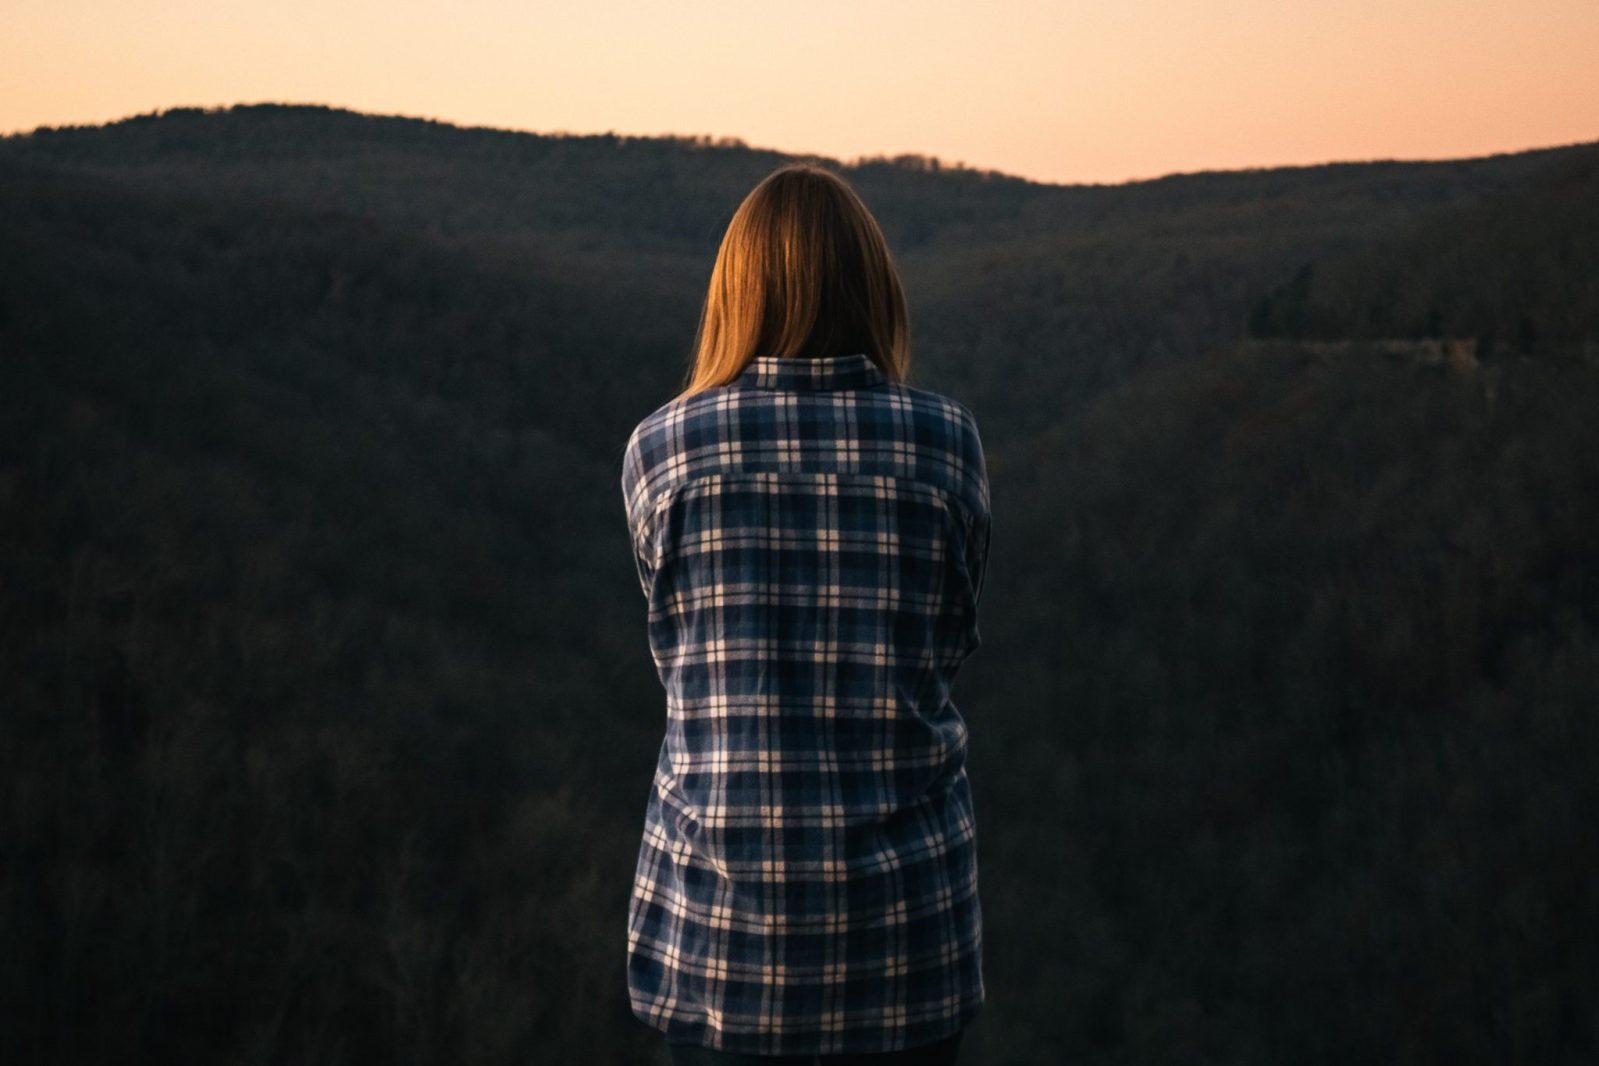 RNFetchBlobTmp 2b18qxzjjcedvqr3o2x7zb - Self-Care, What It Is & Why It Is So Important - A Guest Blog Post By Megan Hemming